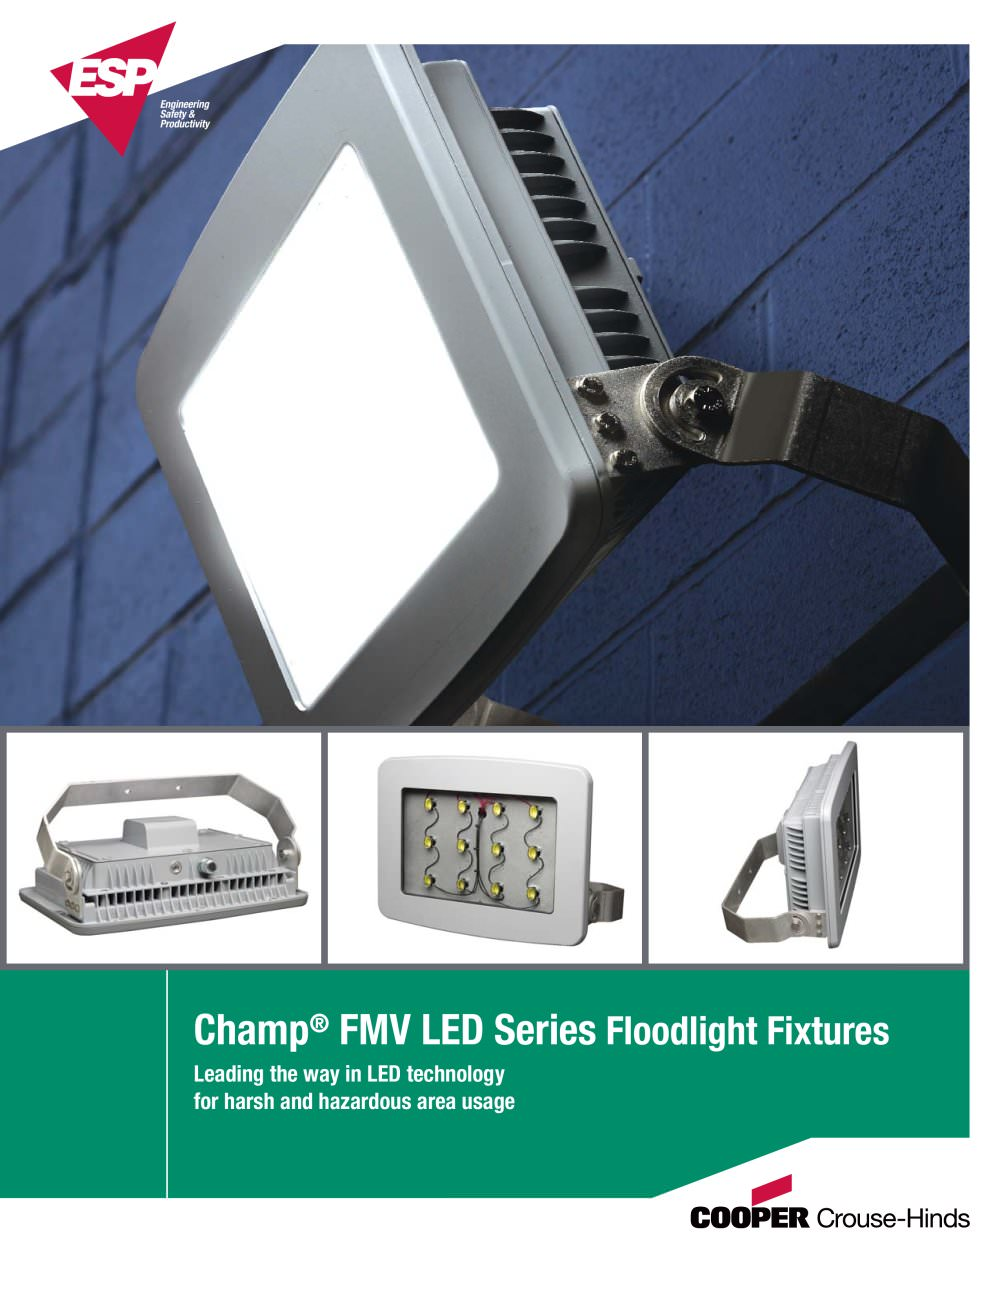 LED Floodlight Brochure - 1 / 8 Pages  sc 1 st  Catalogues Nauticexpo & LED Floodlight Brochure - Cooper Crouse-Hinds Pauluhn - PDF ... azcodes.com